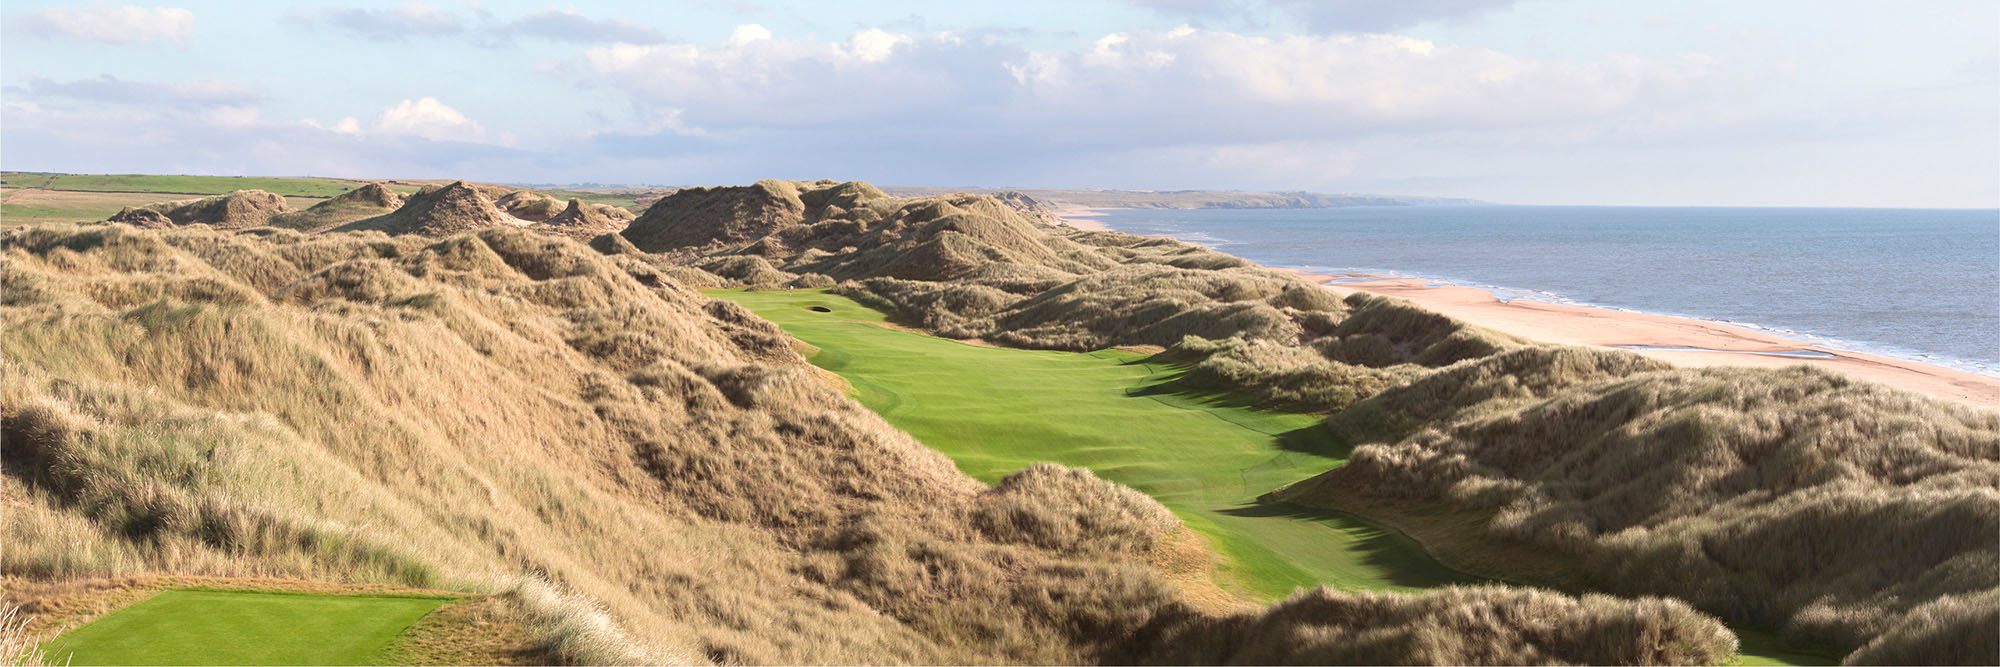 Golf Course Image - Trump International No. 14